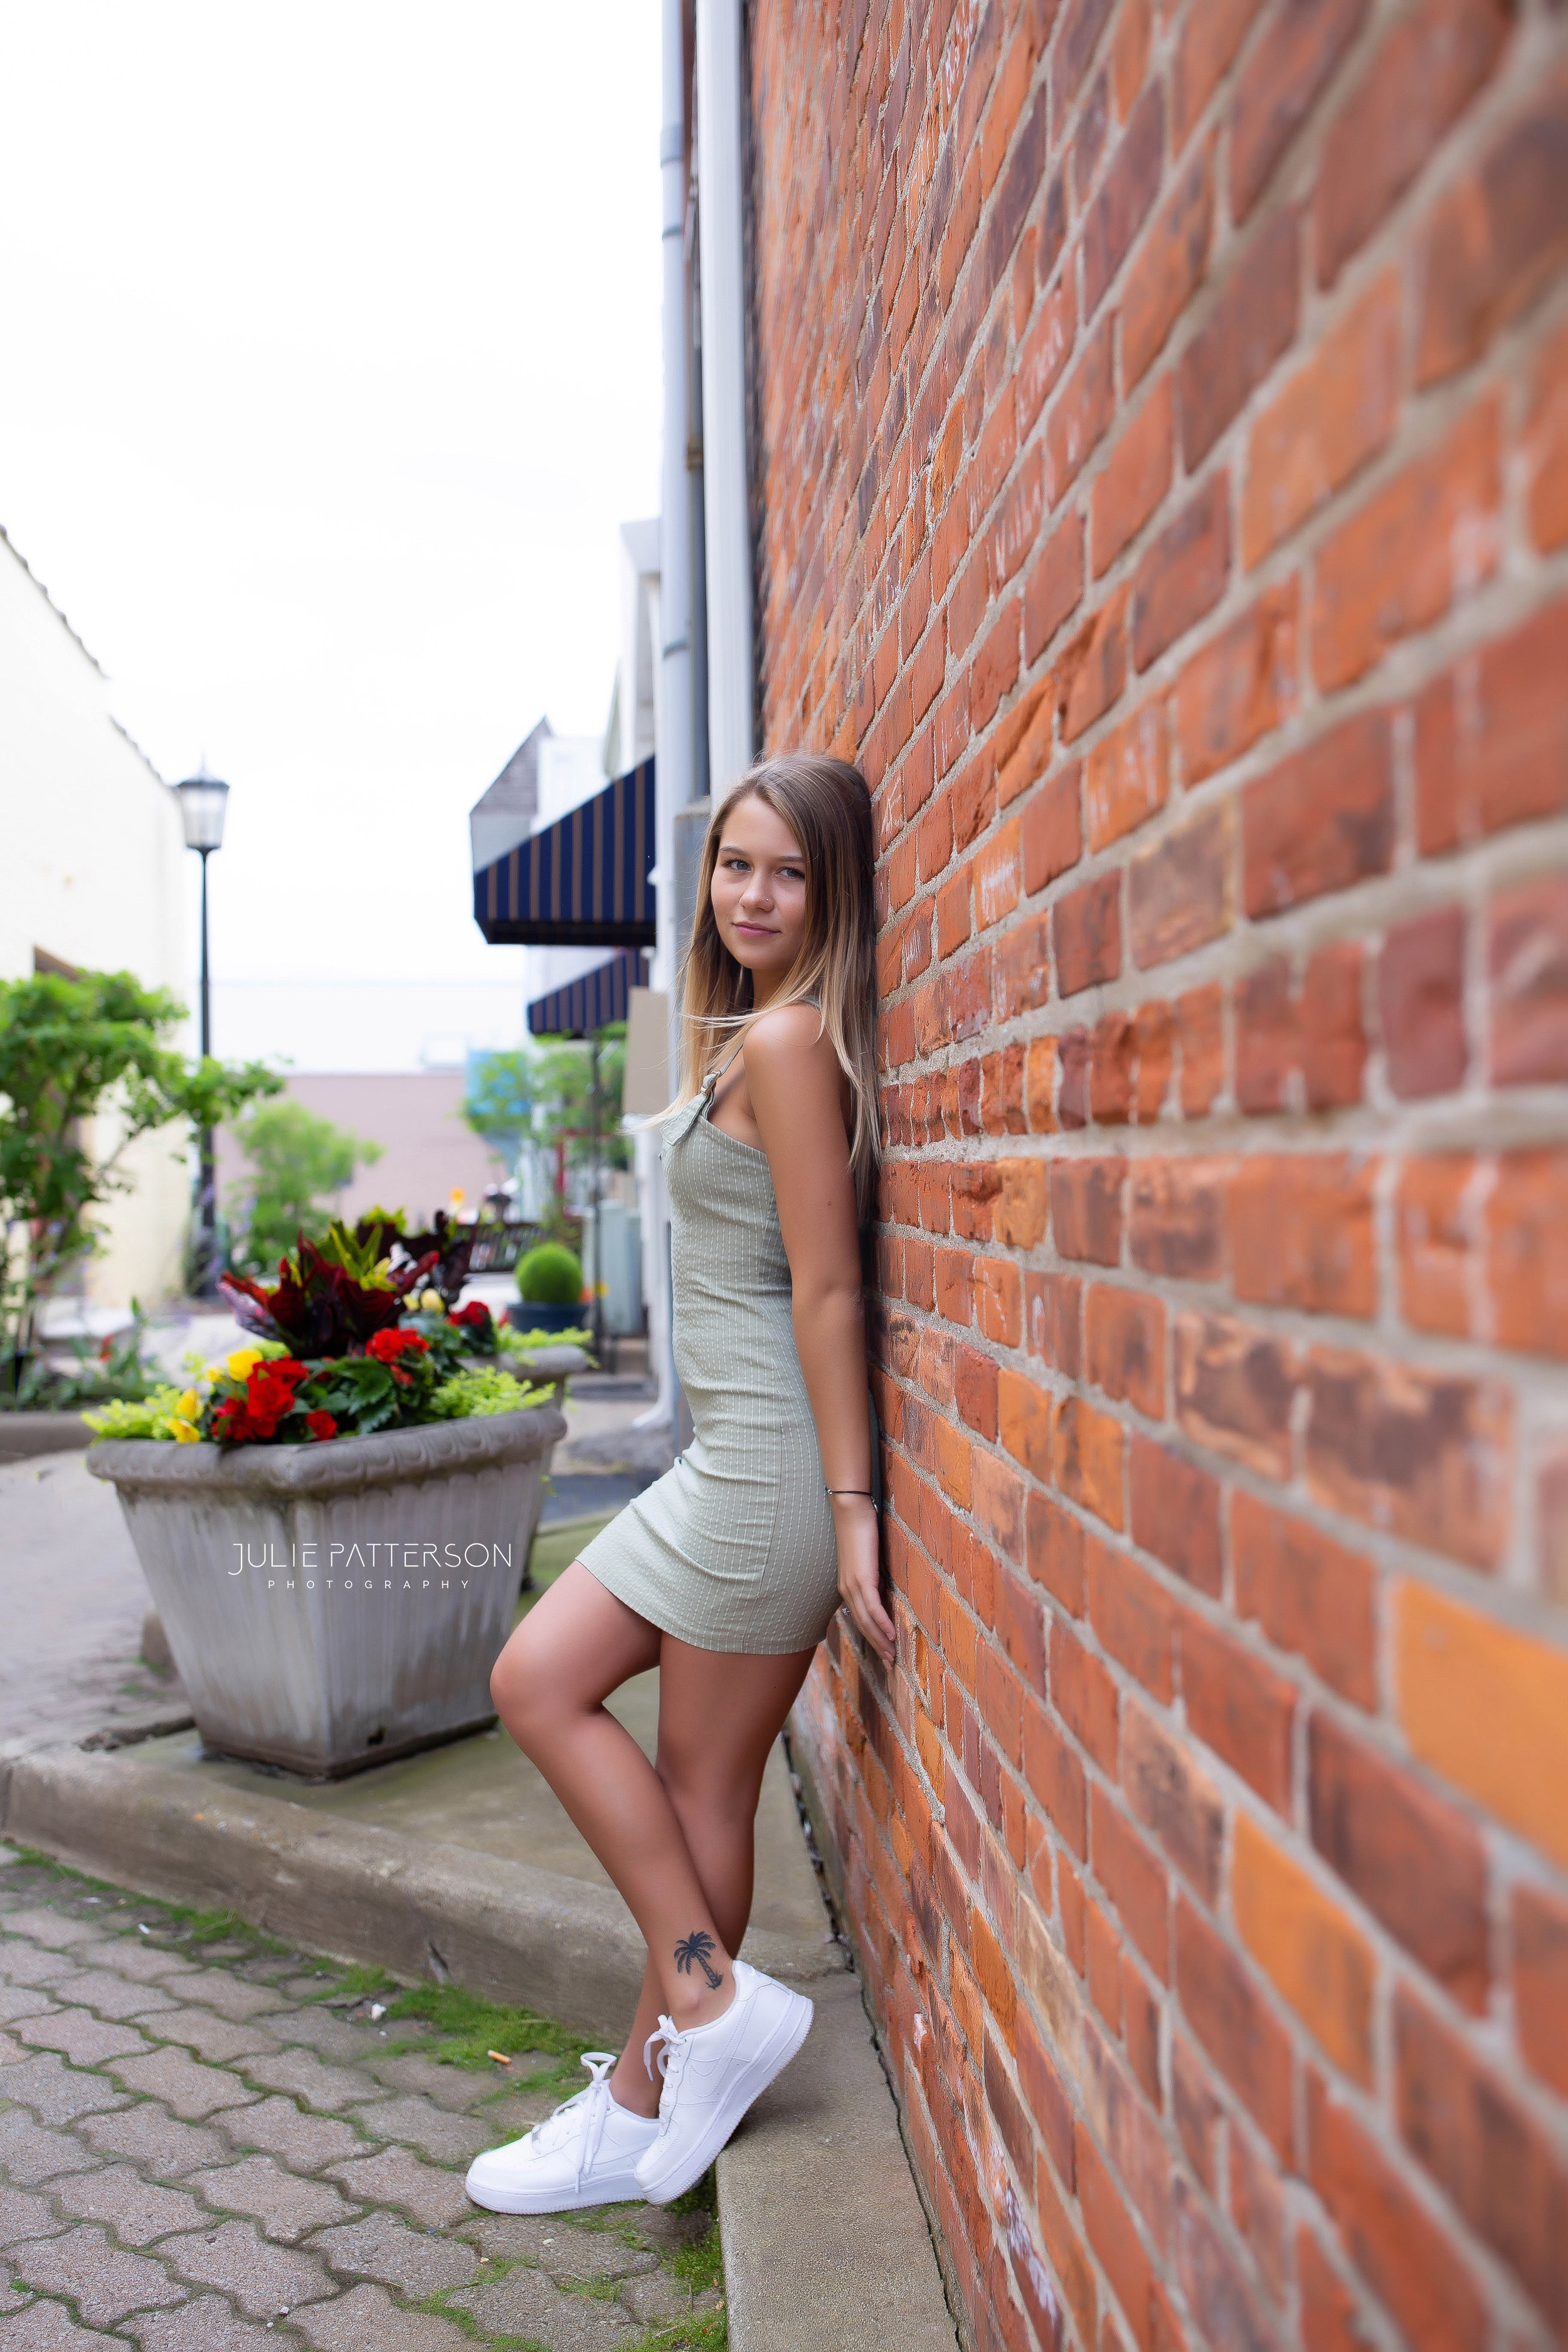 Julie Patterson Photography High School Senior Photographer Northville Michigan Plymouth Canton Milan Ann Arbor Novi Dearborn